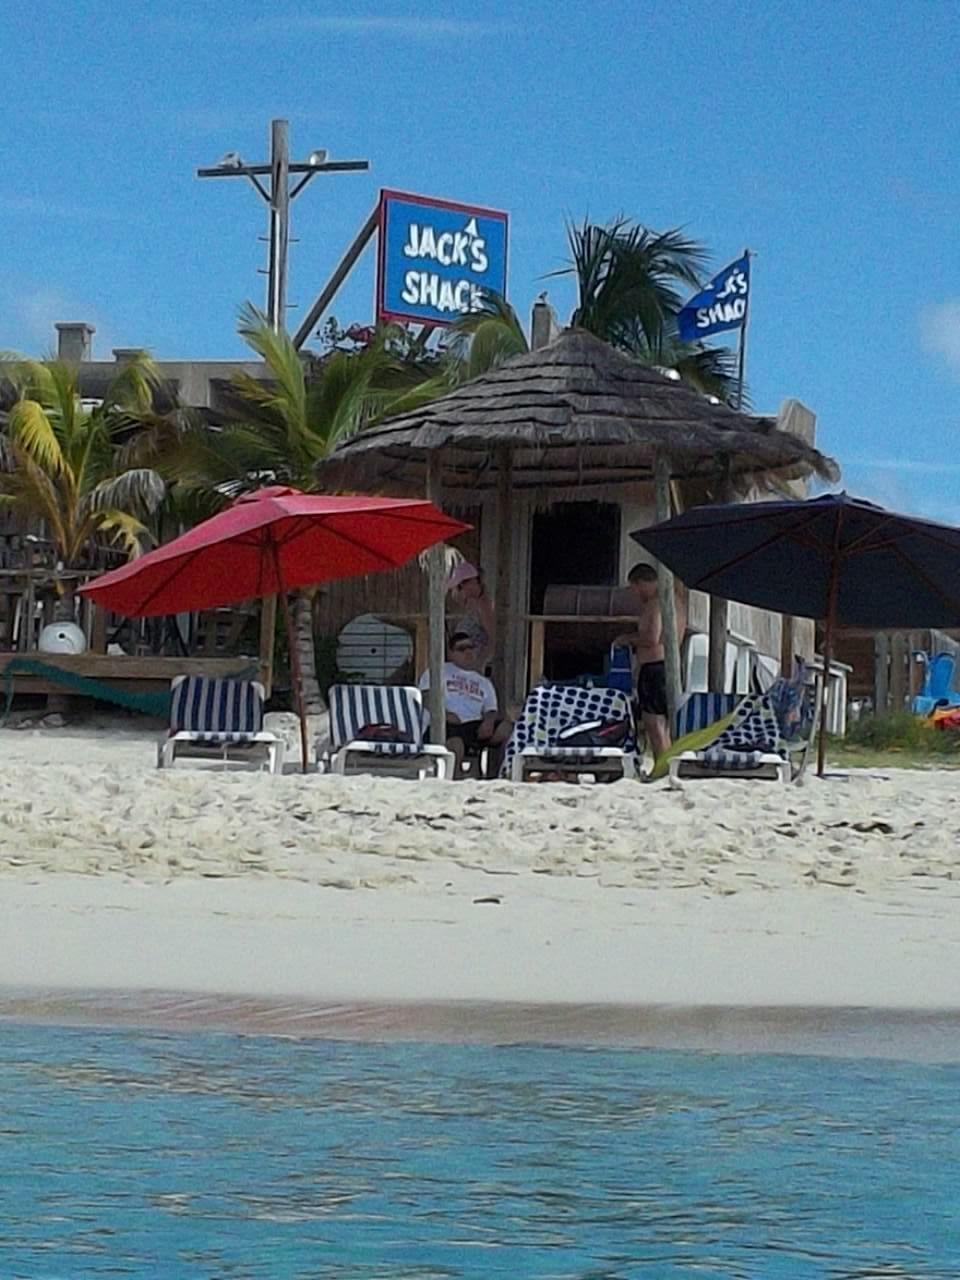 Caribbean weddings grand turk - Jack S Shack Grand Turk My Favorite Beach Bar In Grand Turk